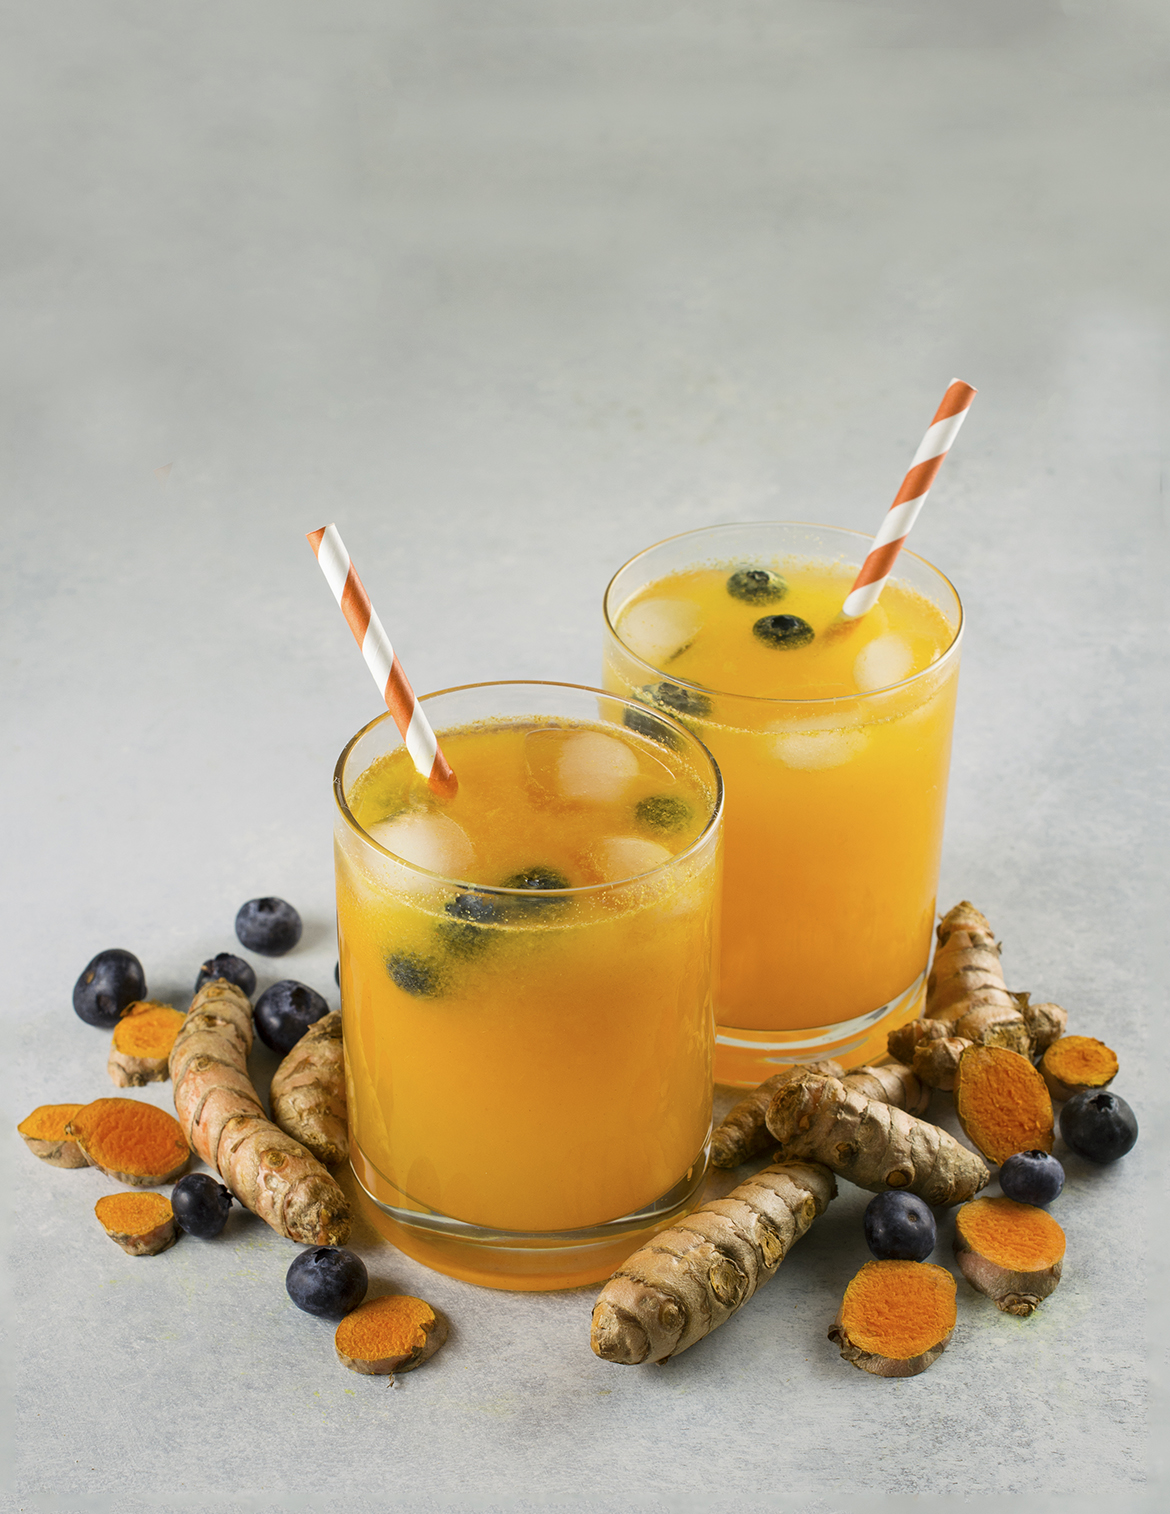 Turmeric Lemonade with Blueberries